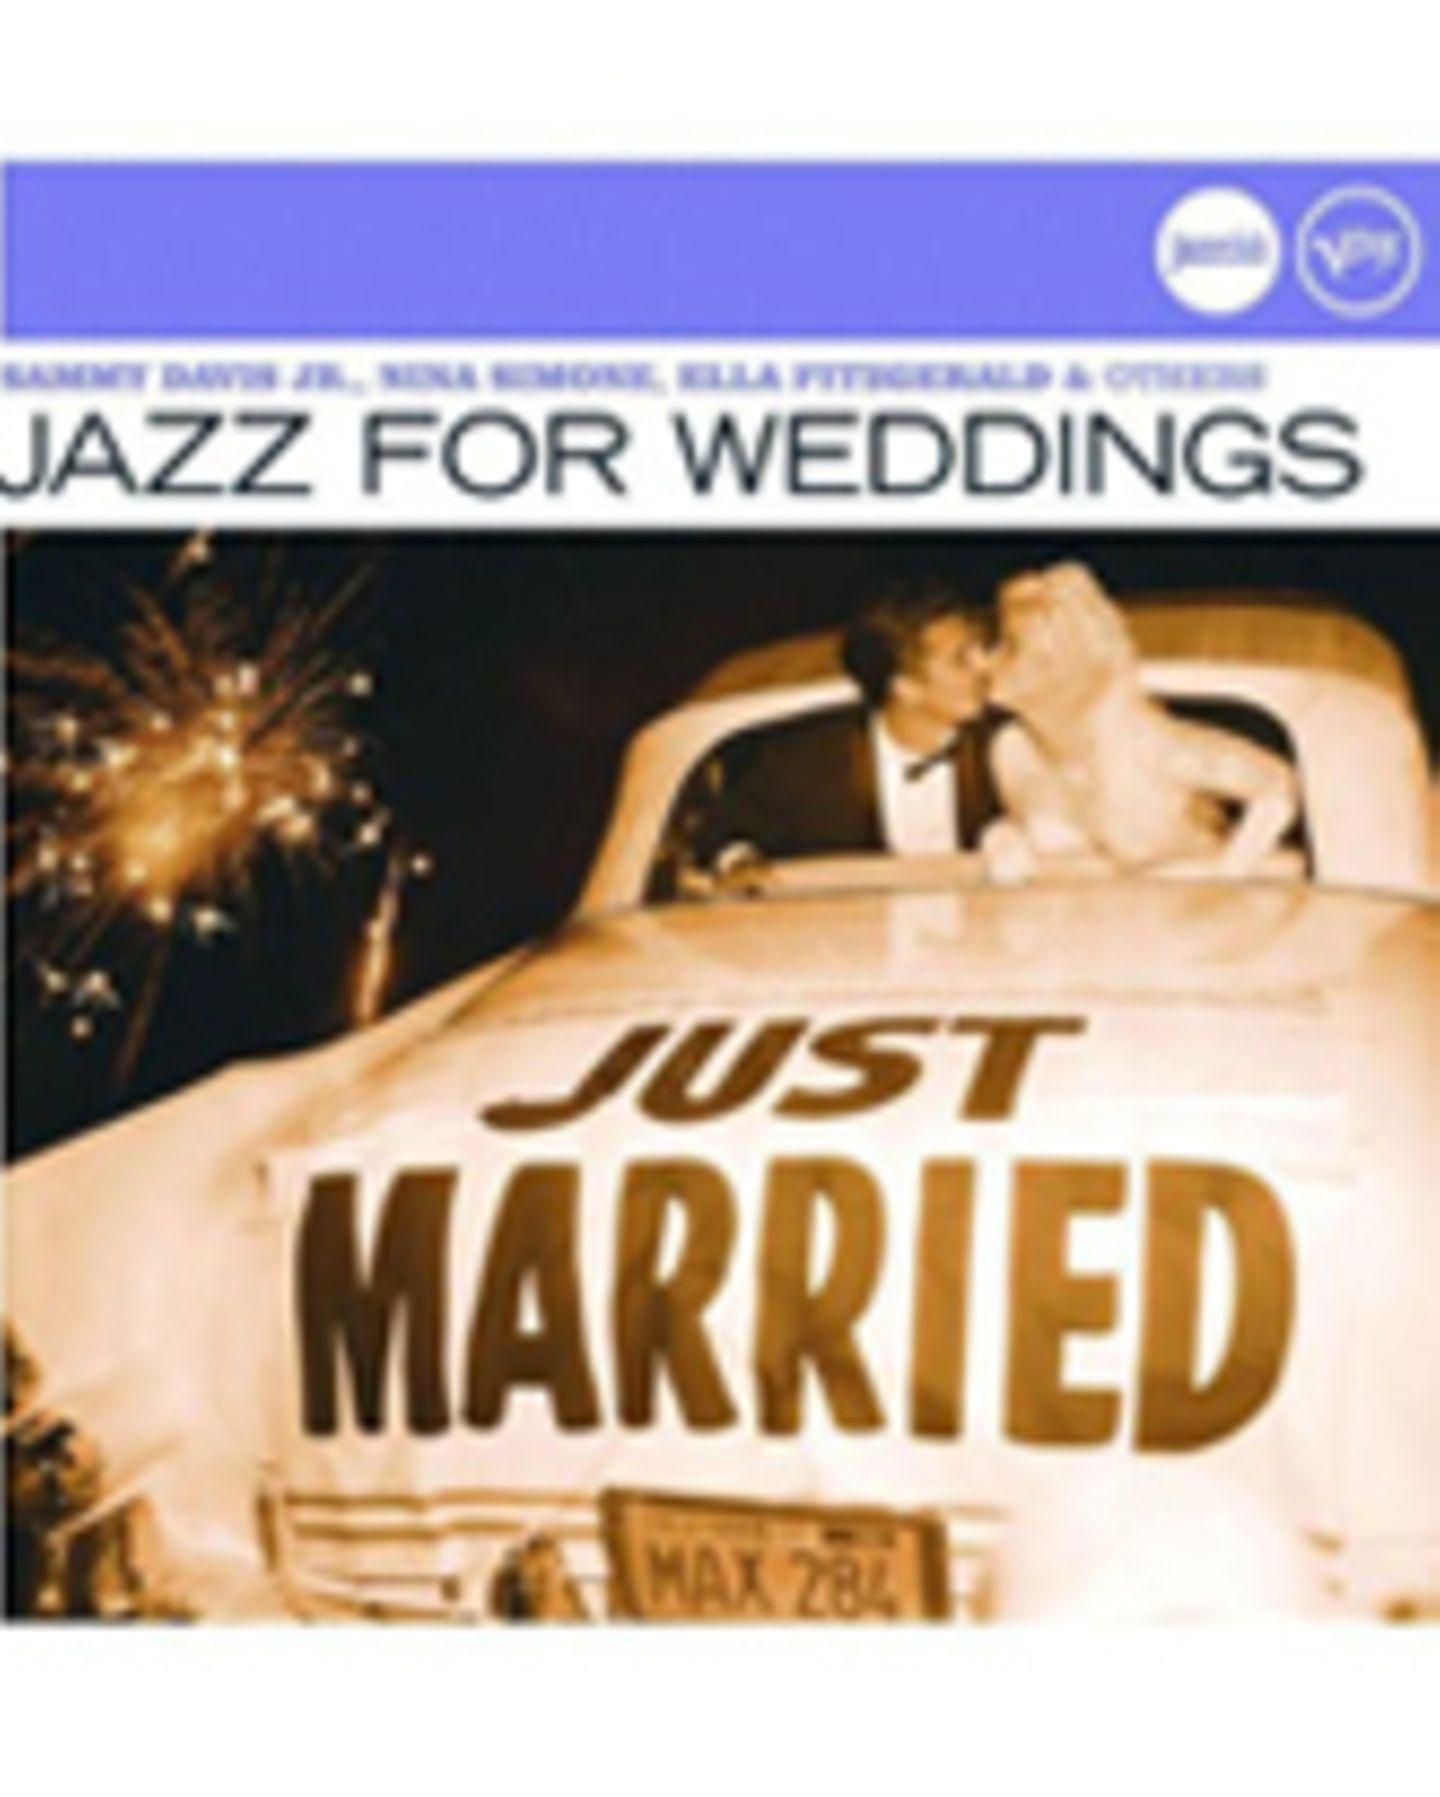 Jazz for Weddings